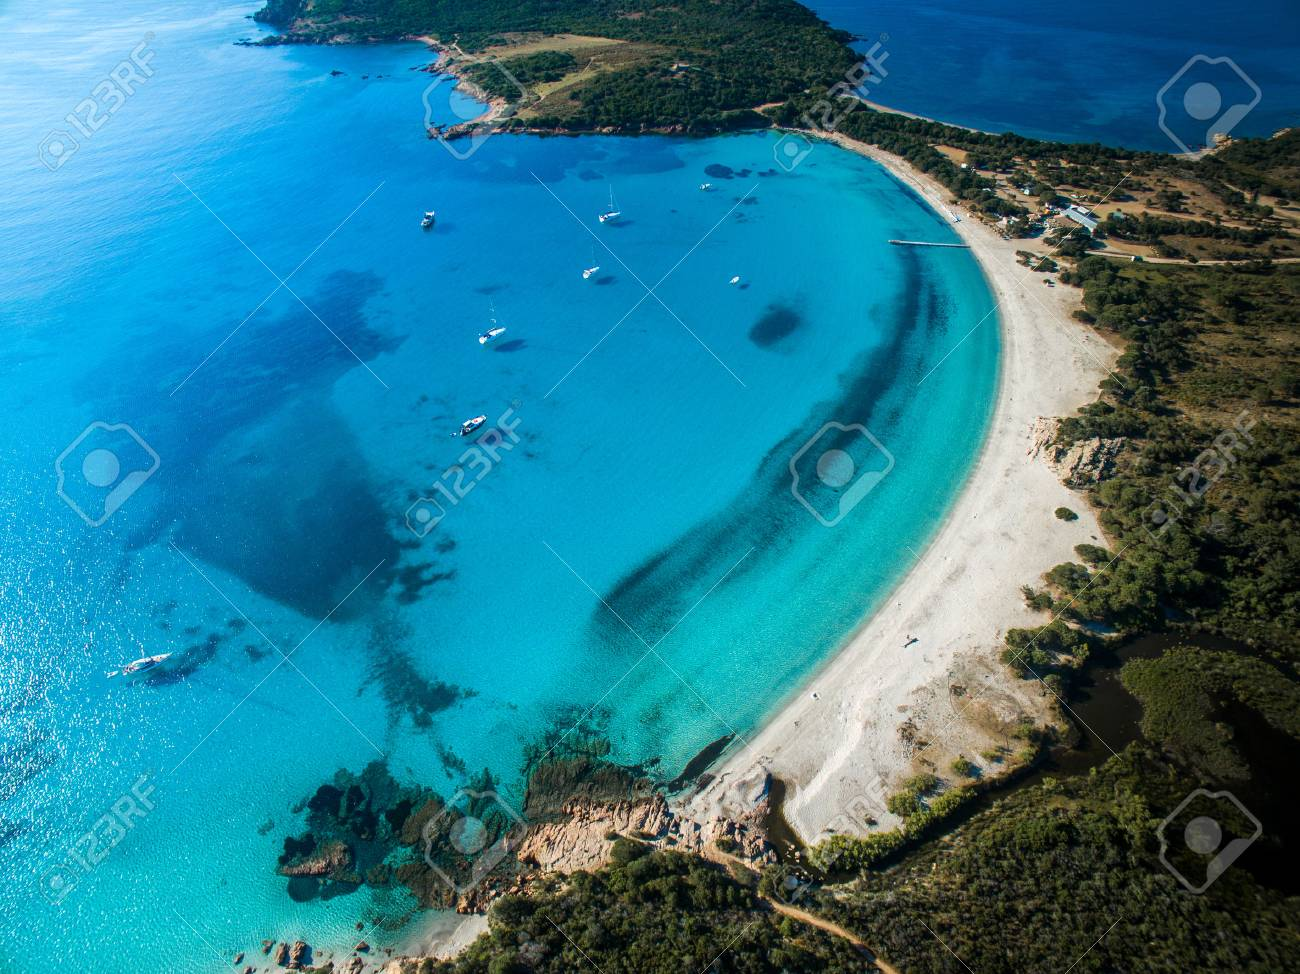 Aerial View of the Splendid Rondinara Beach, Corsica, France - 60593395